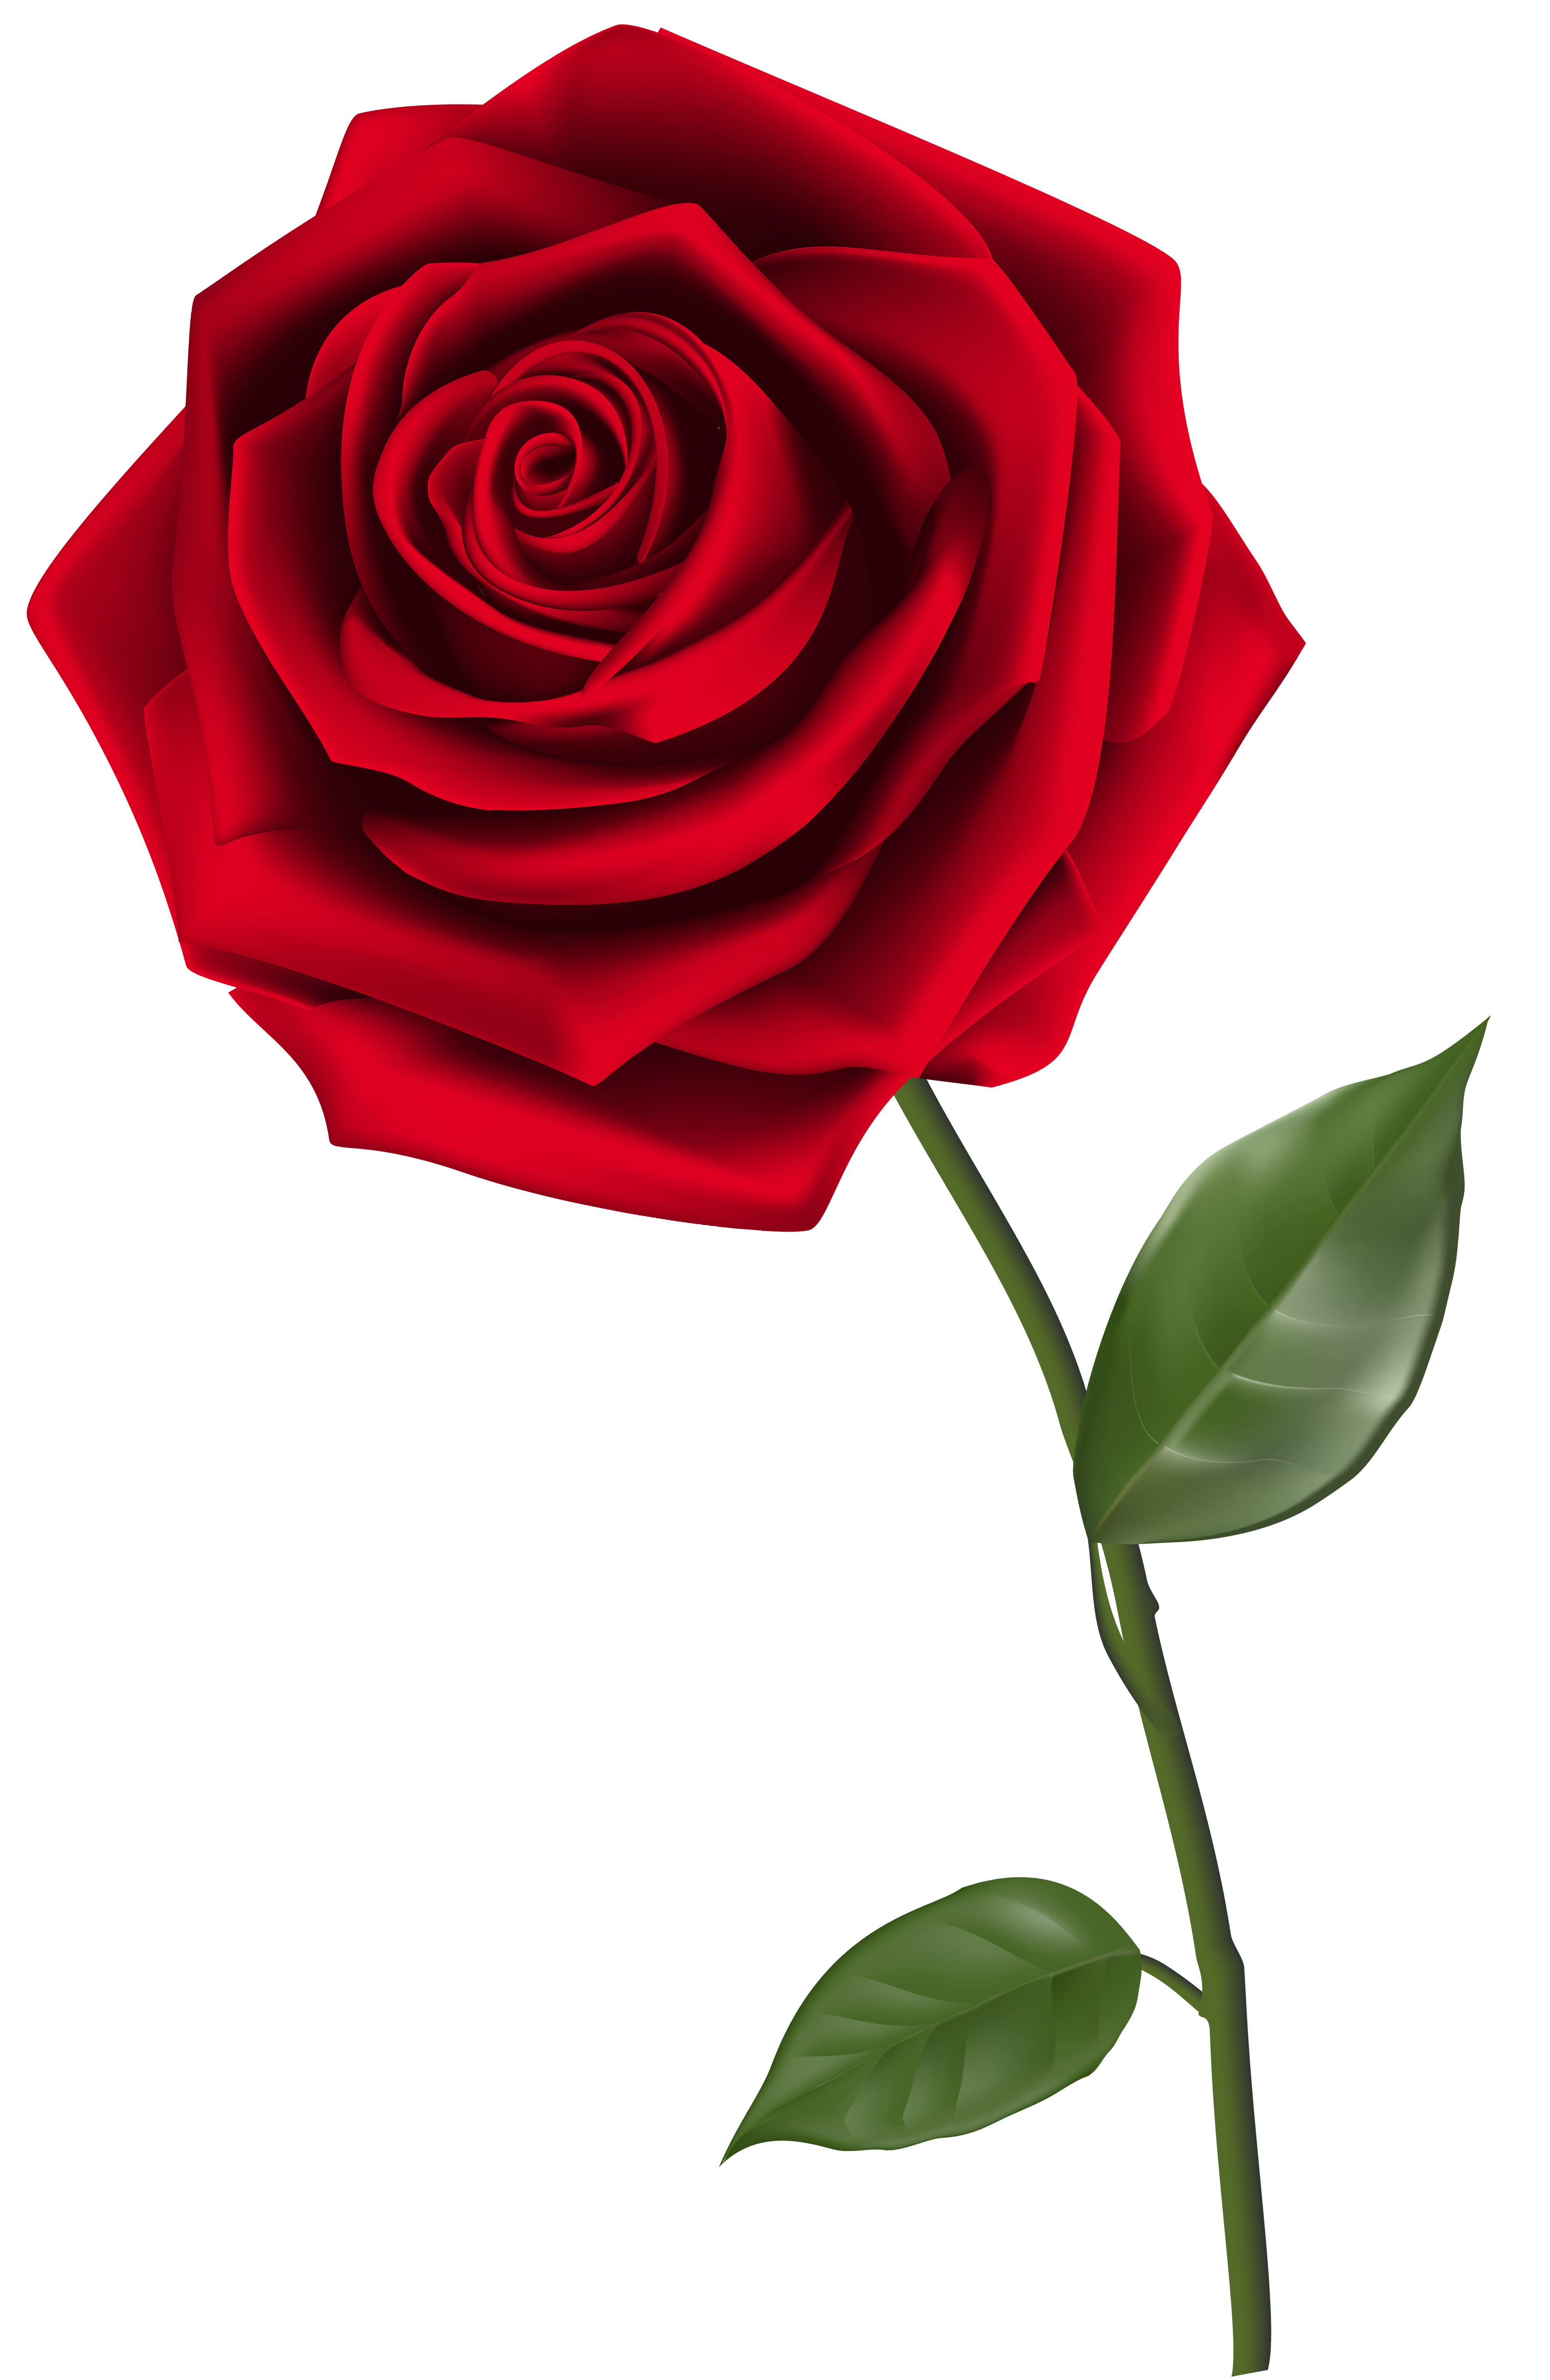 HQ Rose Wallpapers | File 4093.98Kb